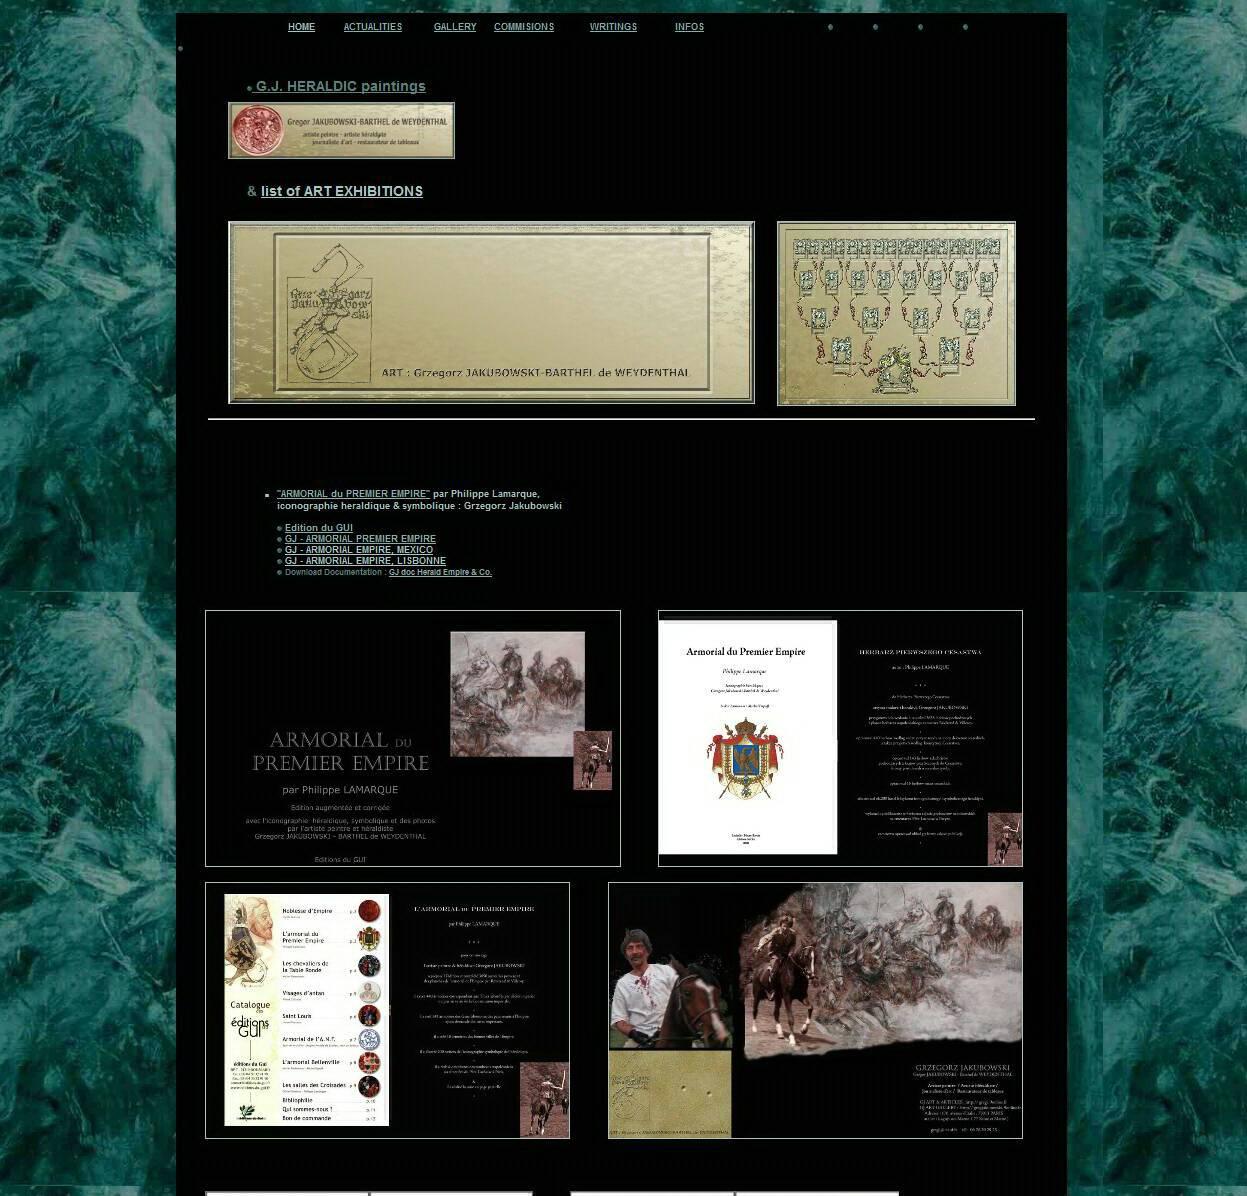 Gregor JAKUBOWSKI ART website